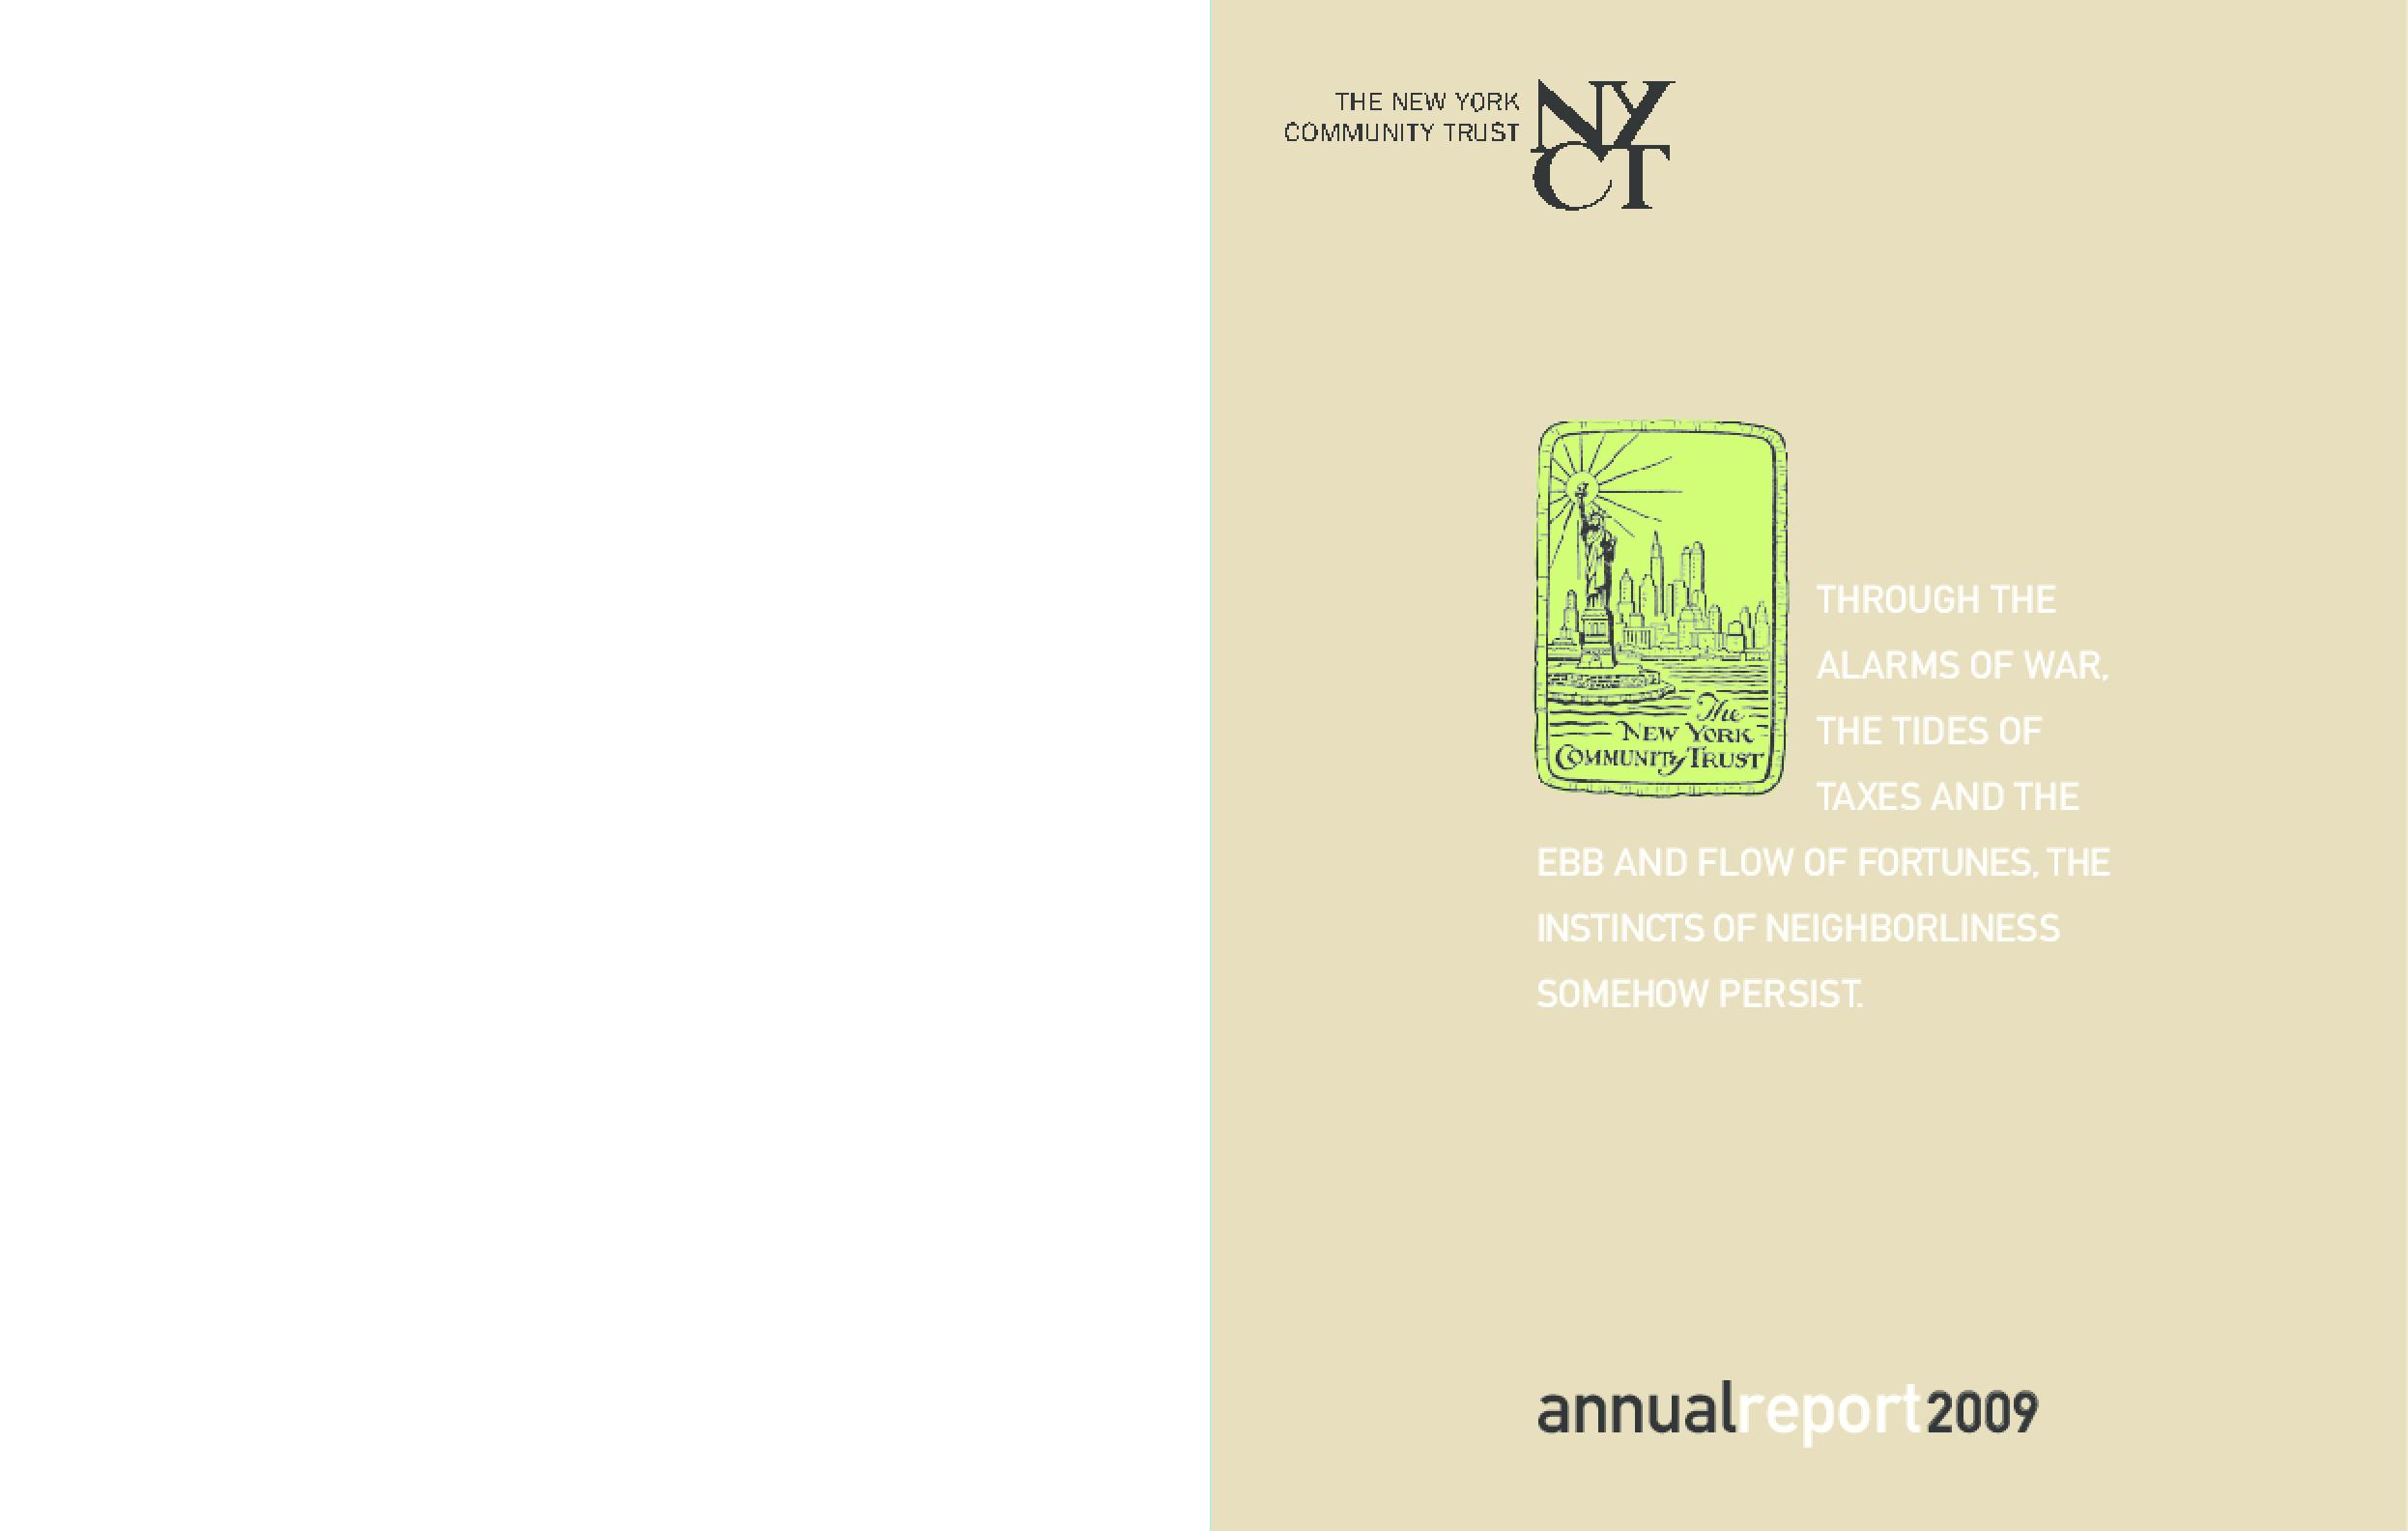 New York Community Trust - 2009 Annual Report